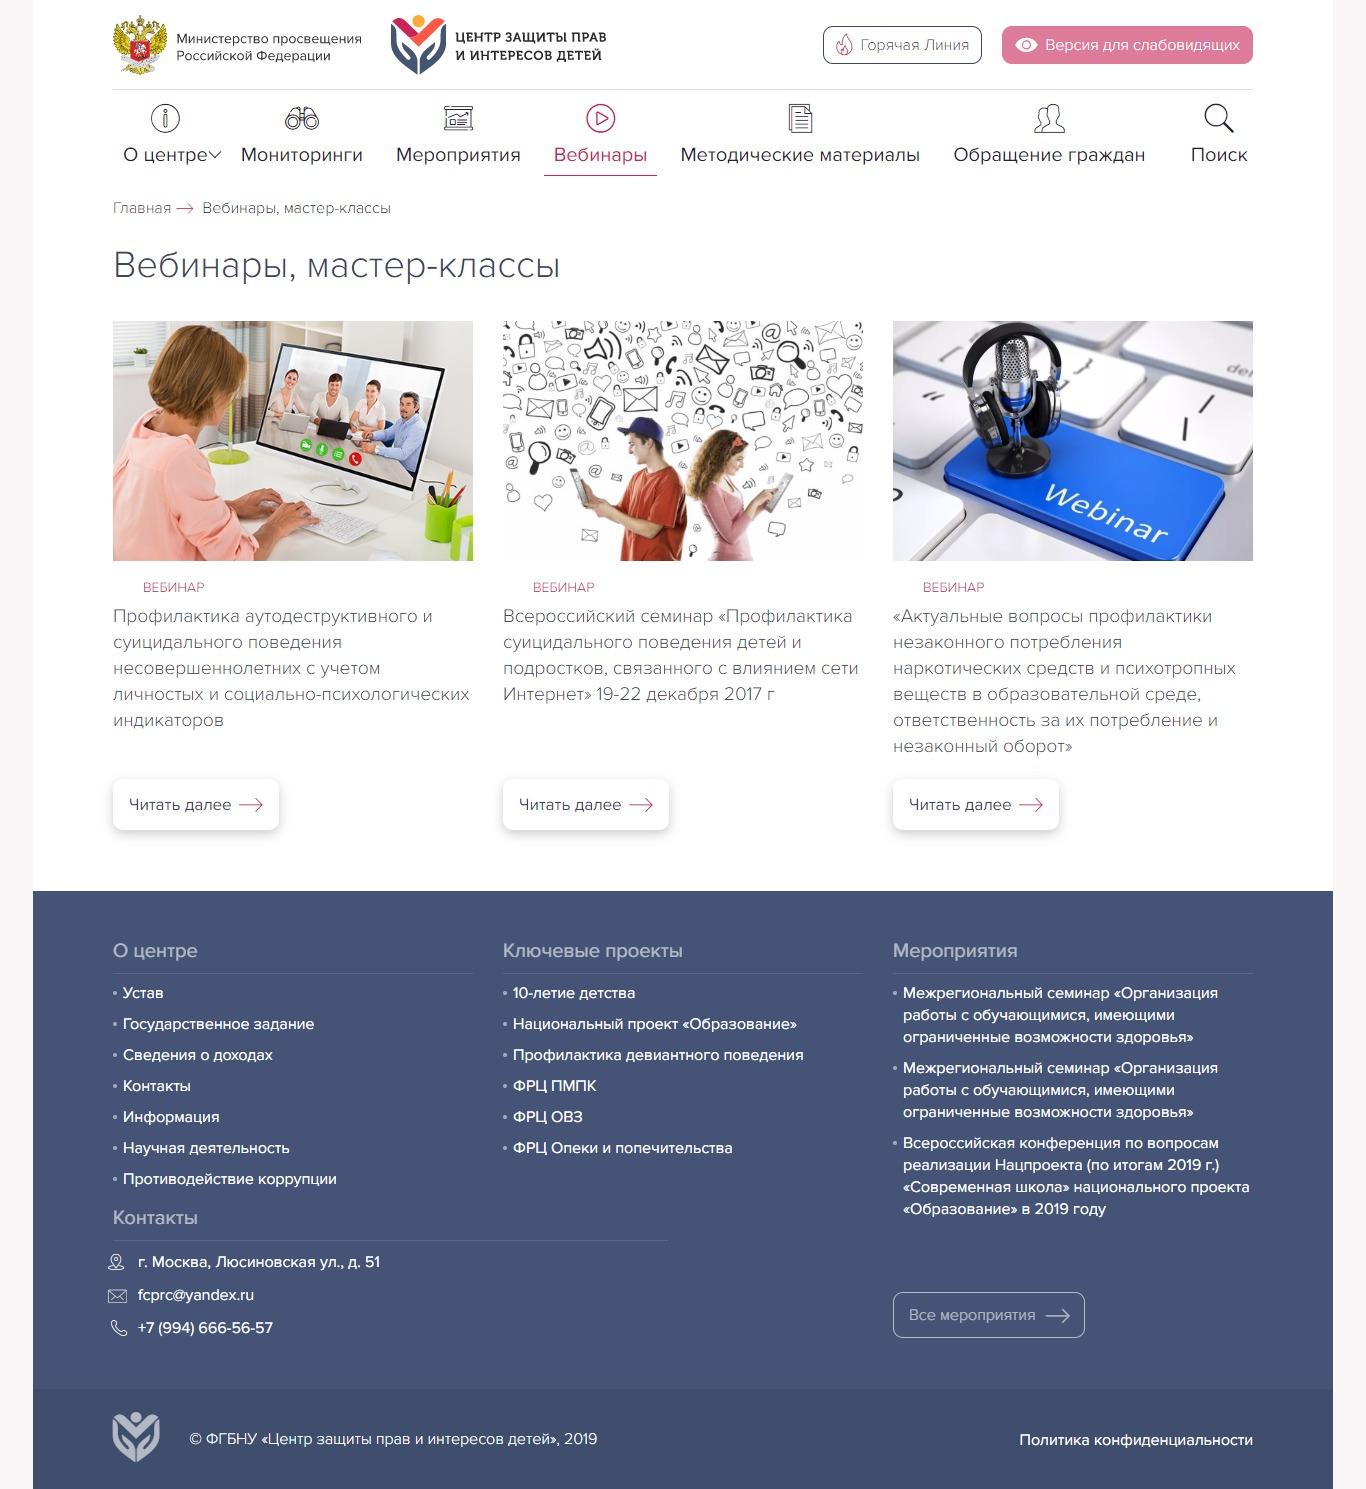 iMac webinars